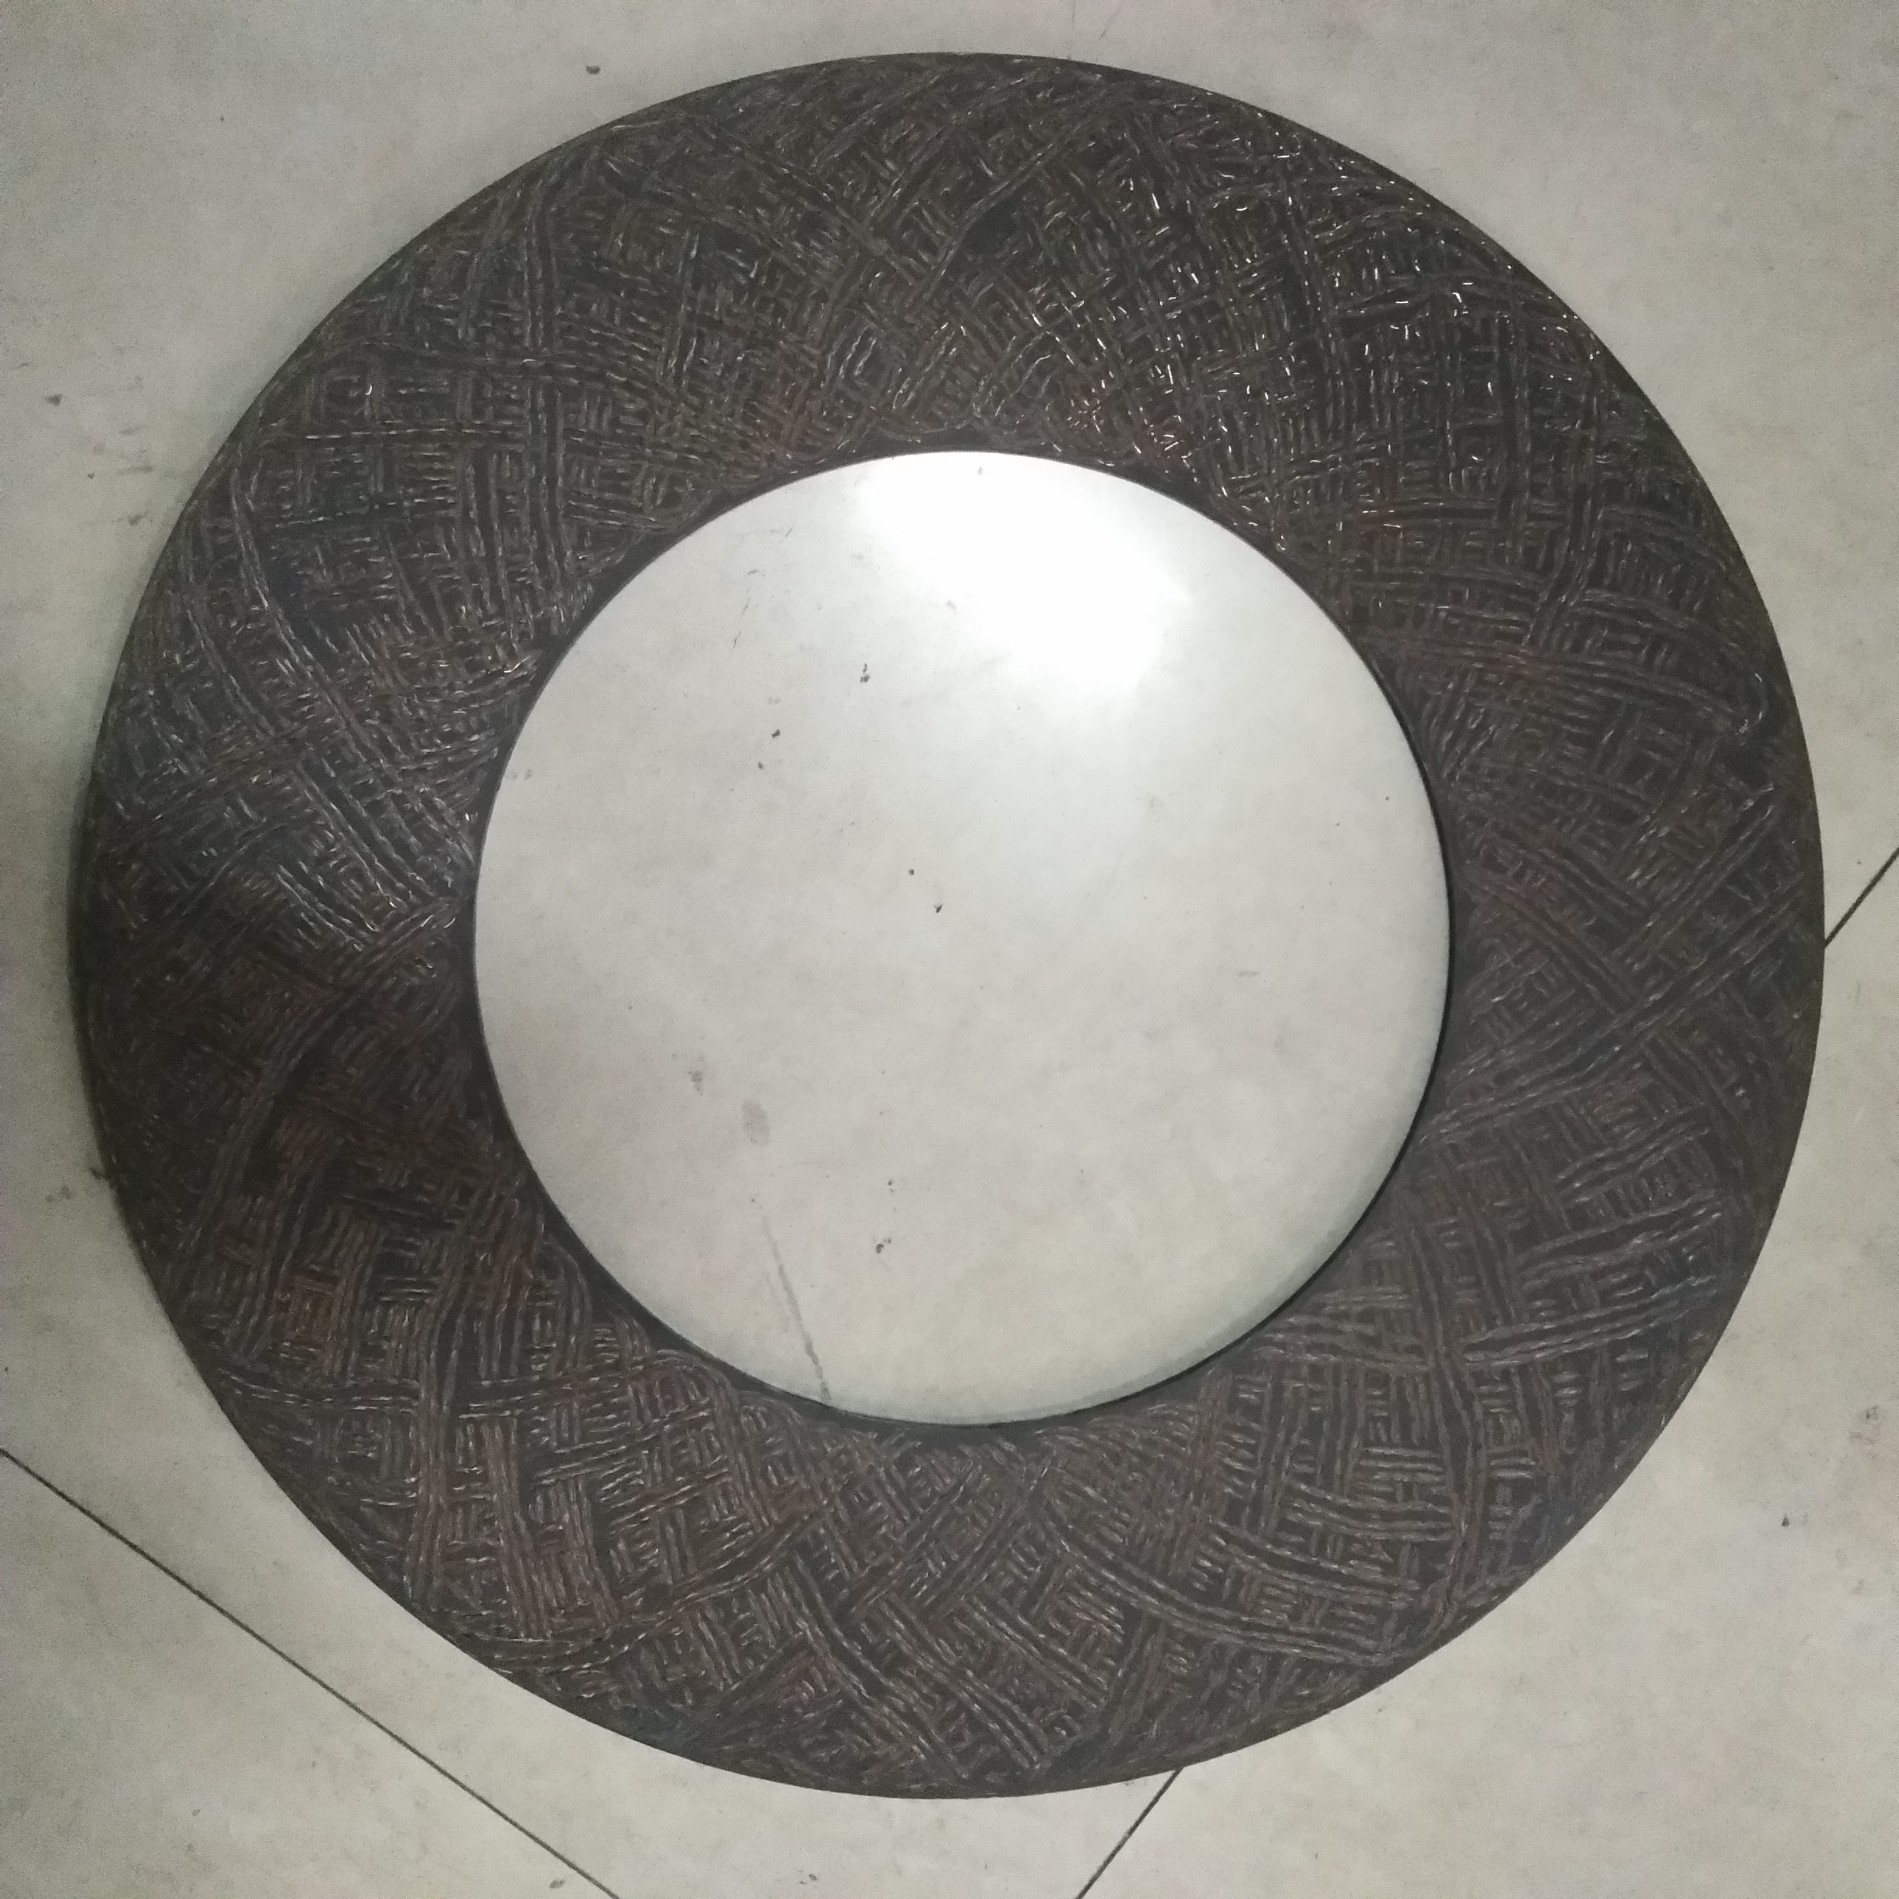 Aramid Volvo Clutch Plate Facing